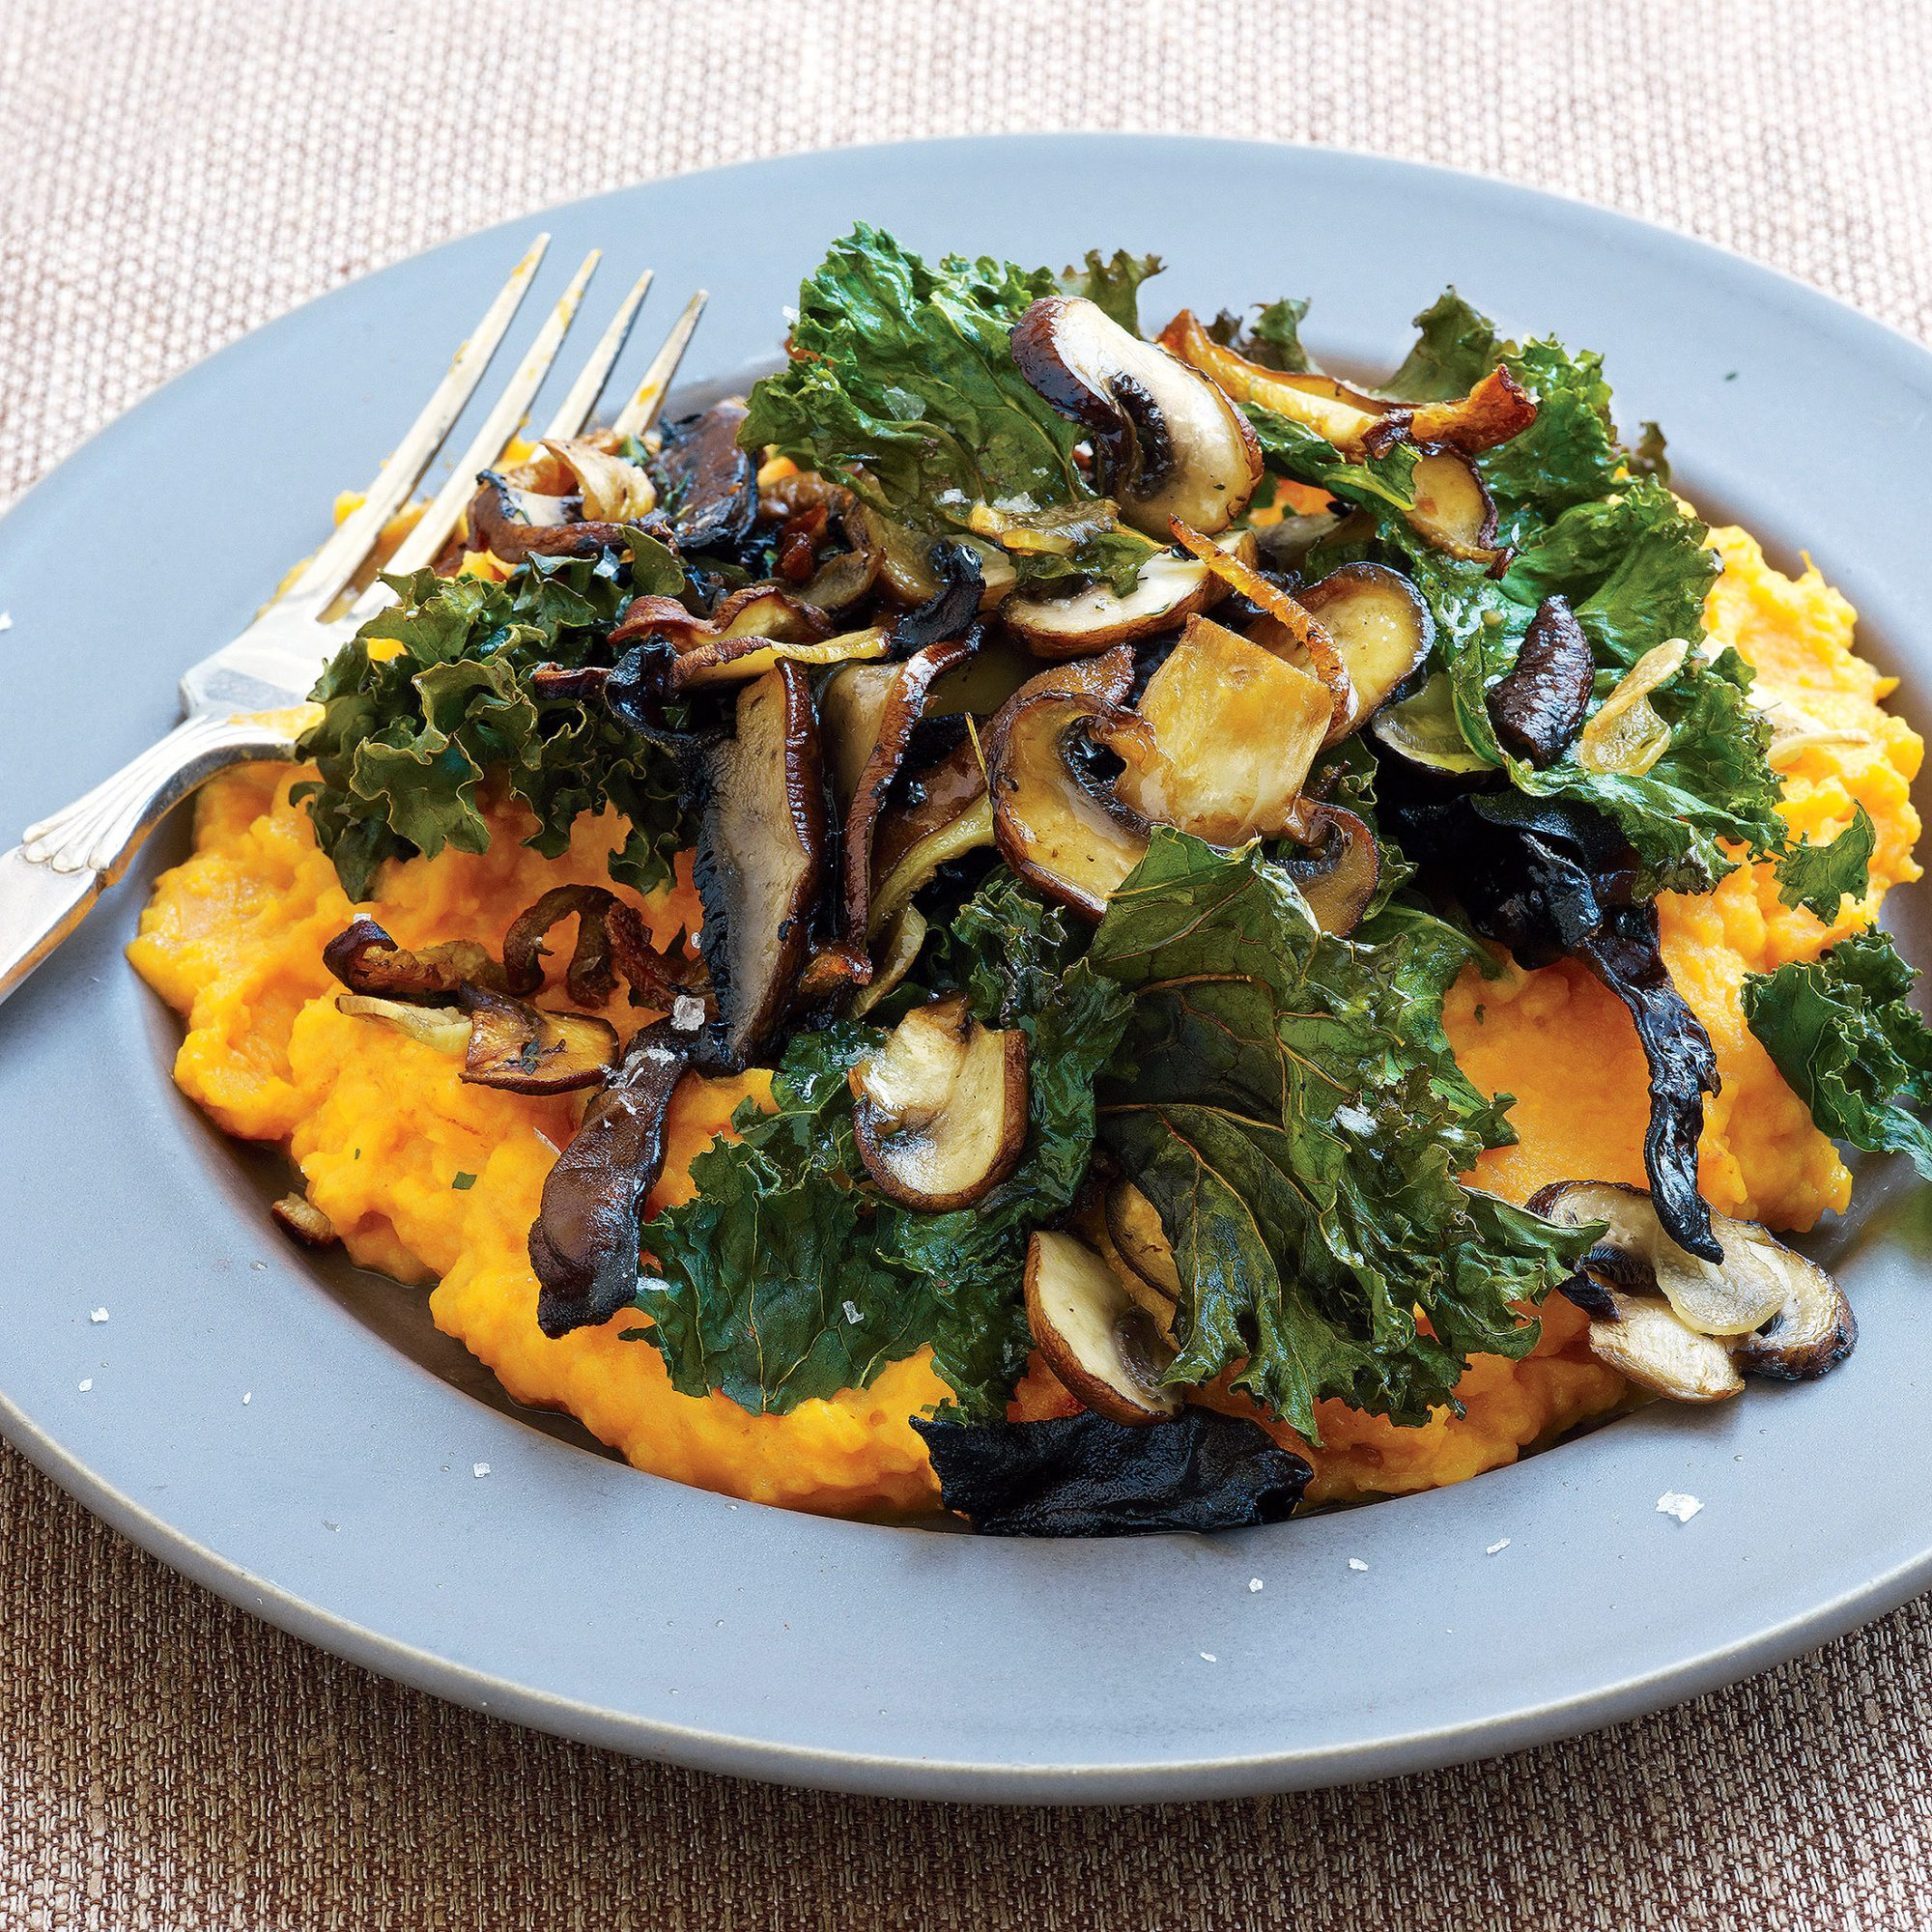 Roast Mushrooms and Kale over Mashed Sweet Potatoes